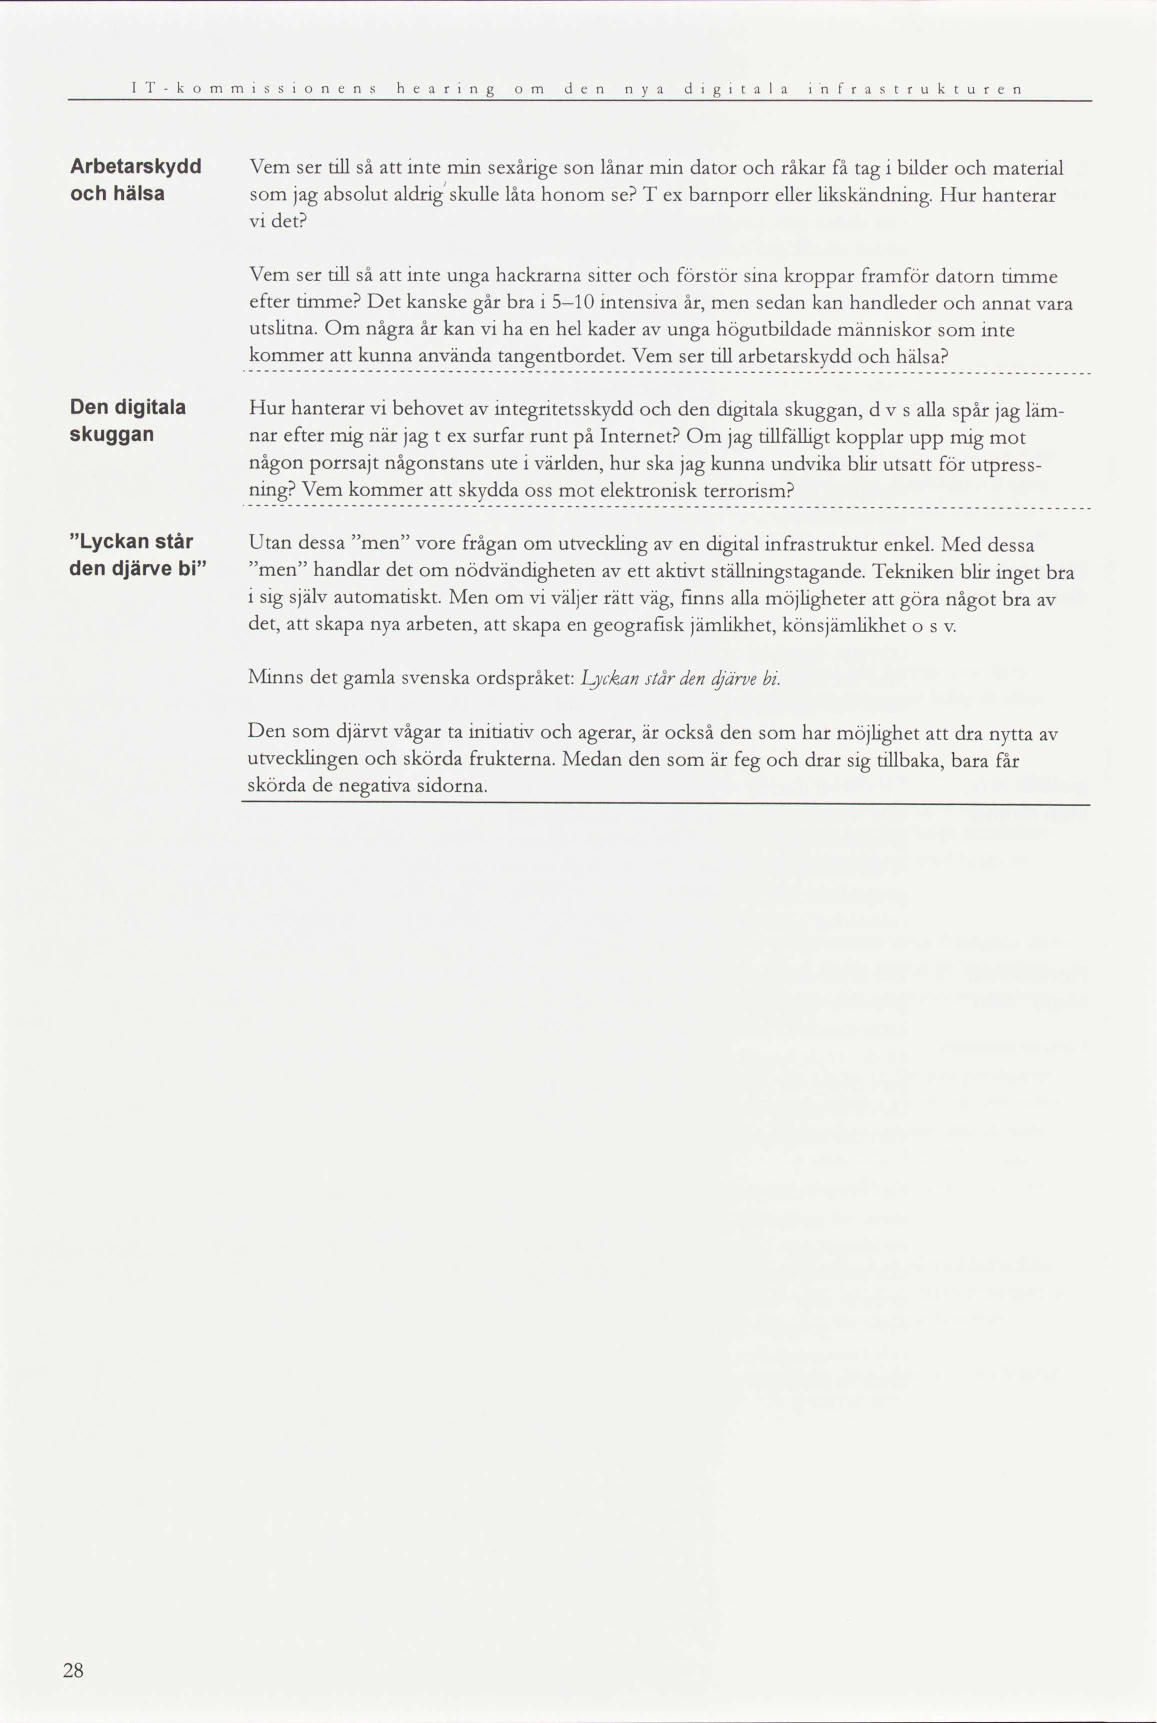 Stenbecks okande son gor ansprak pa arvet